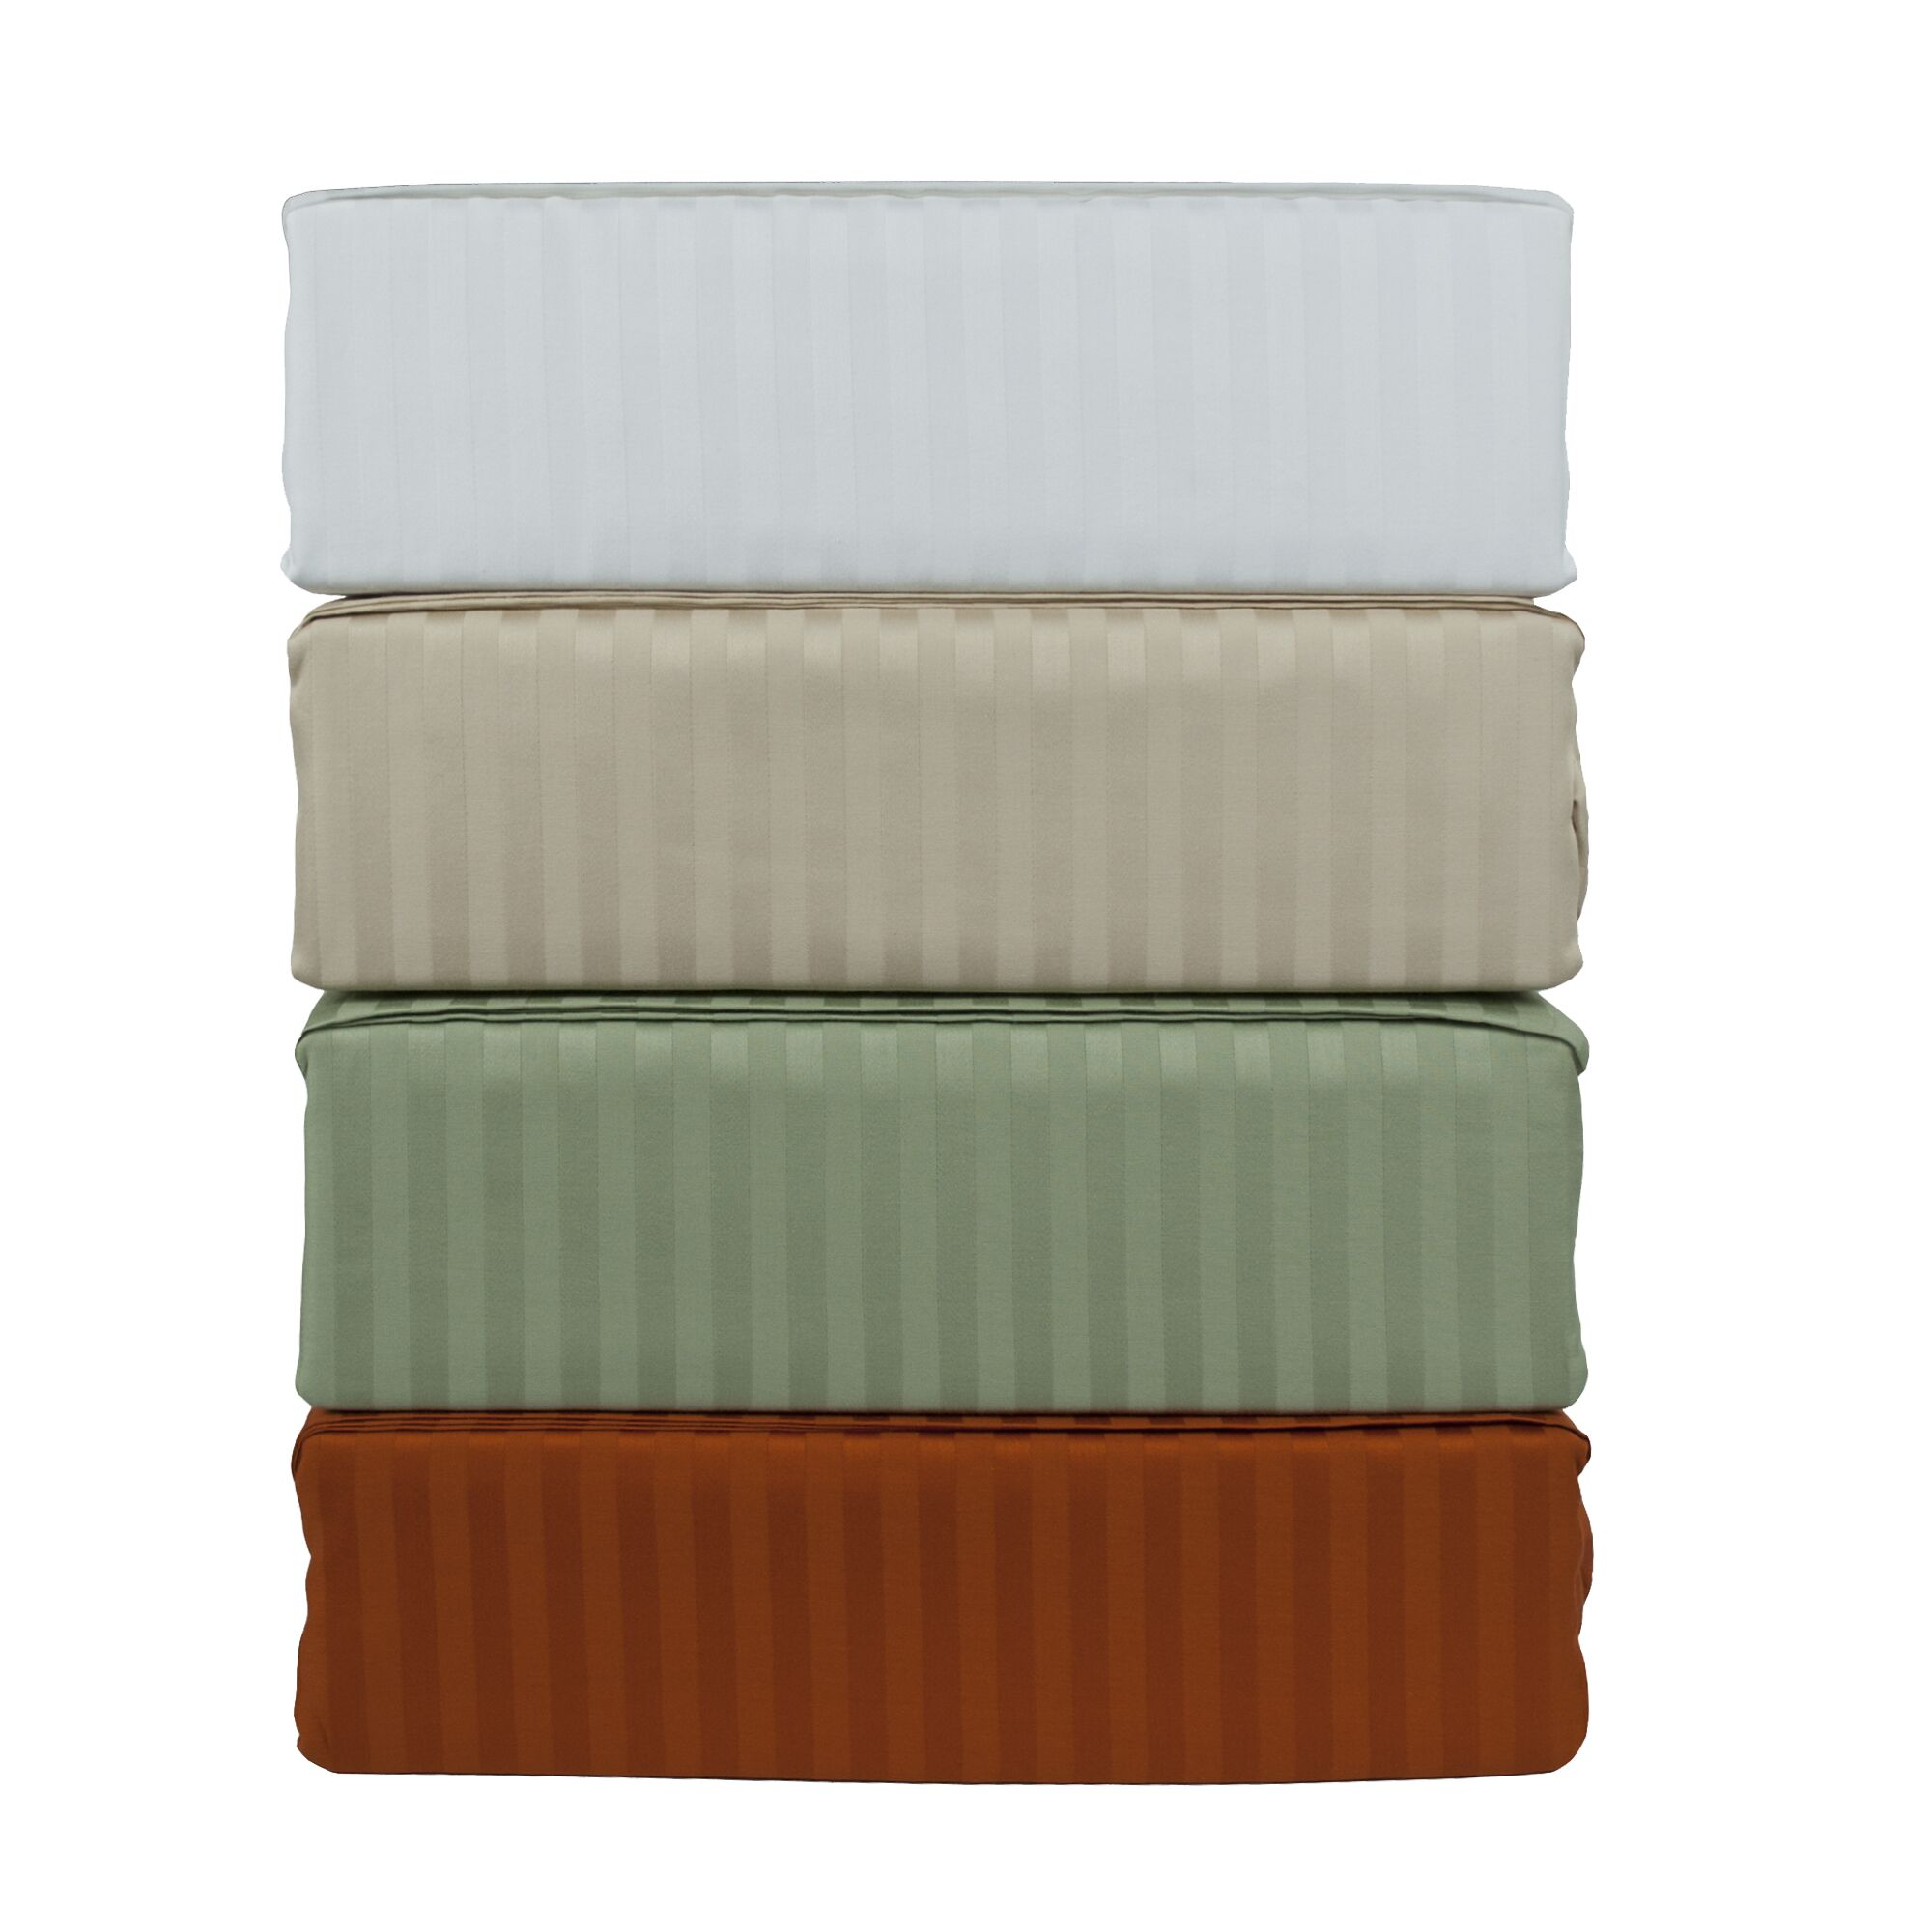 Mohan 300 Thread Count 100% Cotton Sheet Set Color: Beige, Size: Queen